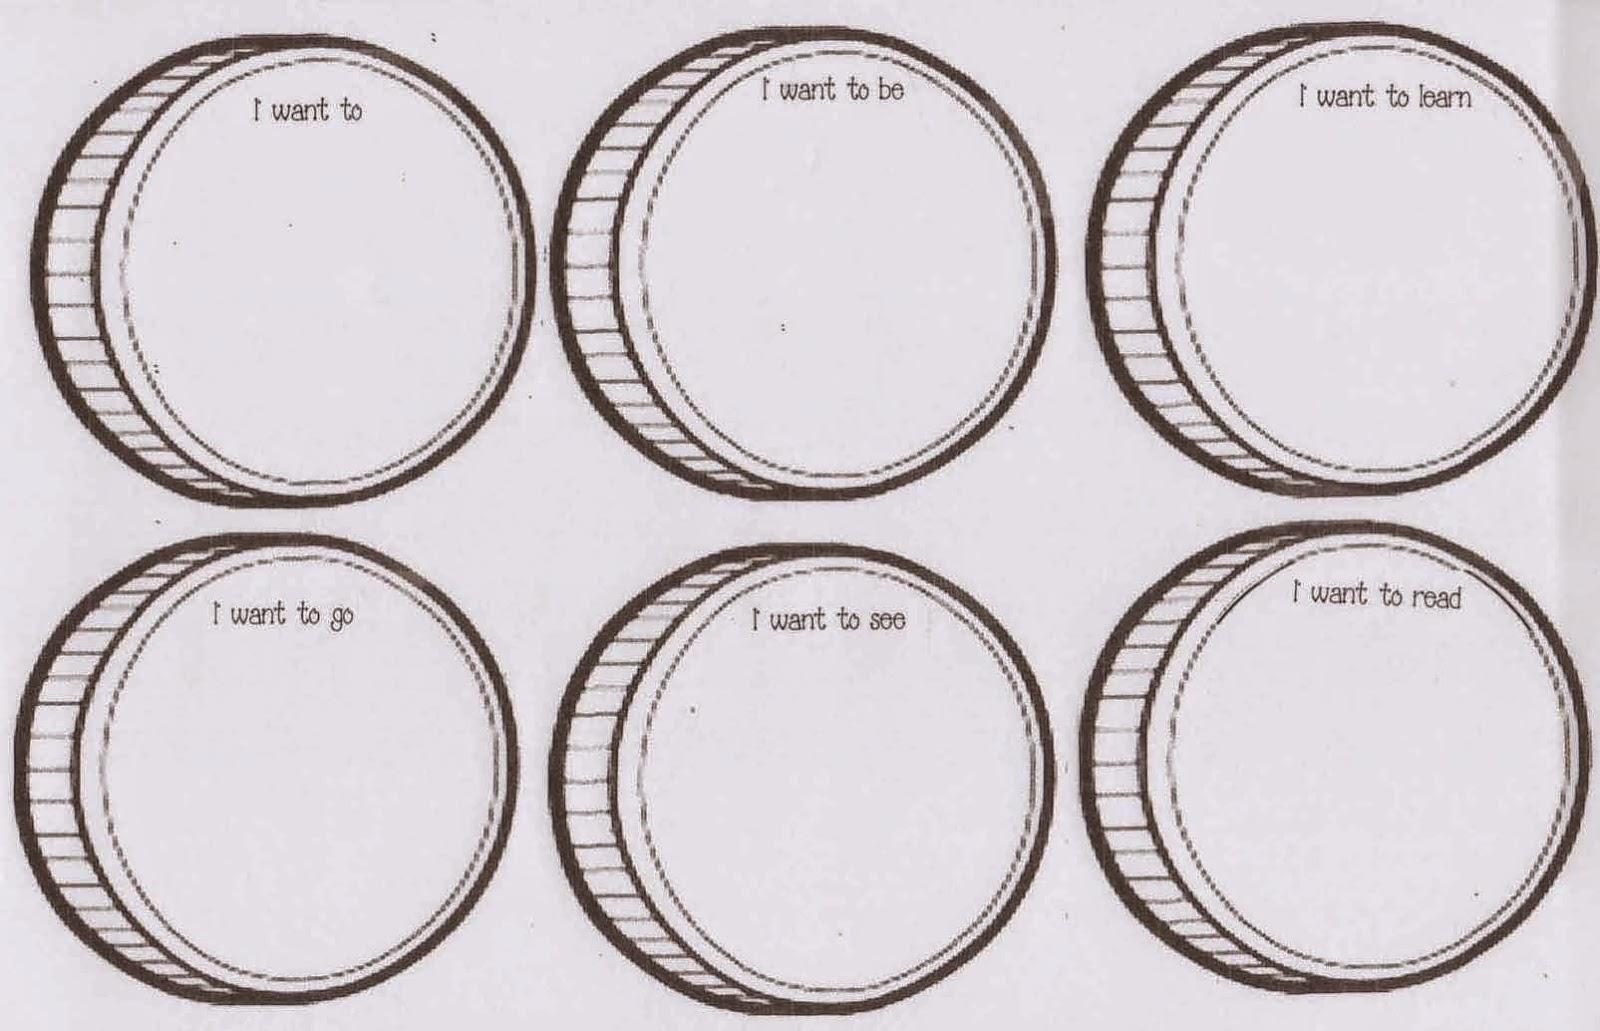 classroom freebies pot of goals march writing prompt craft